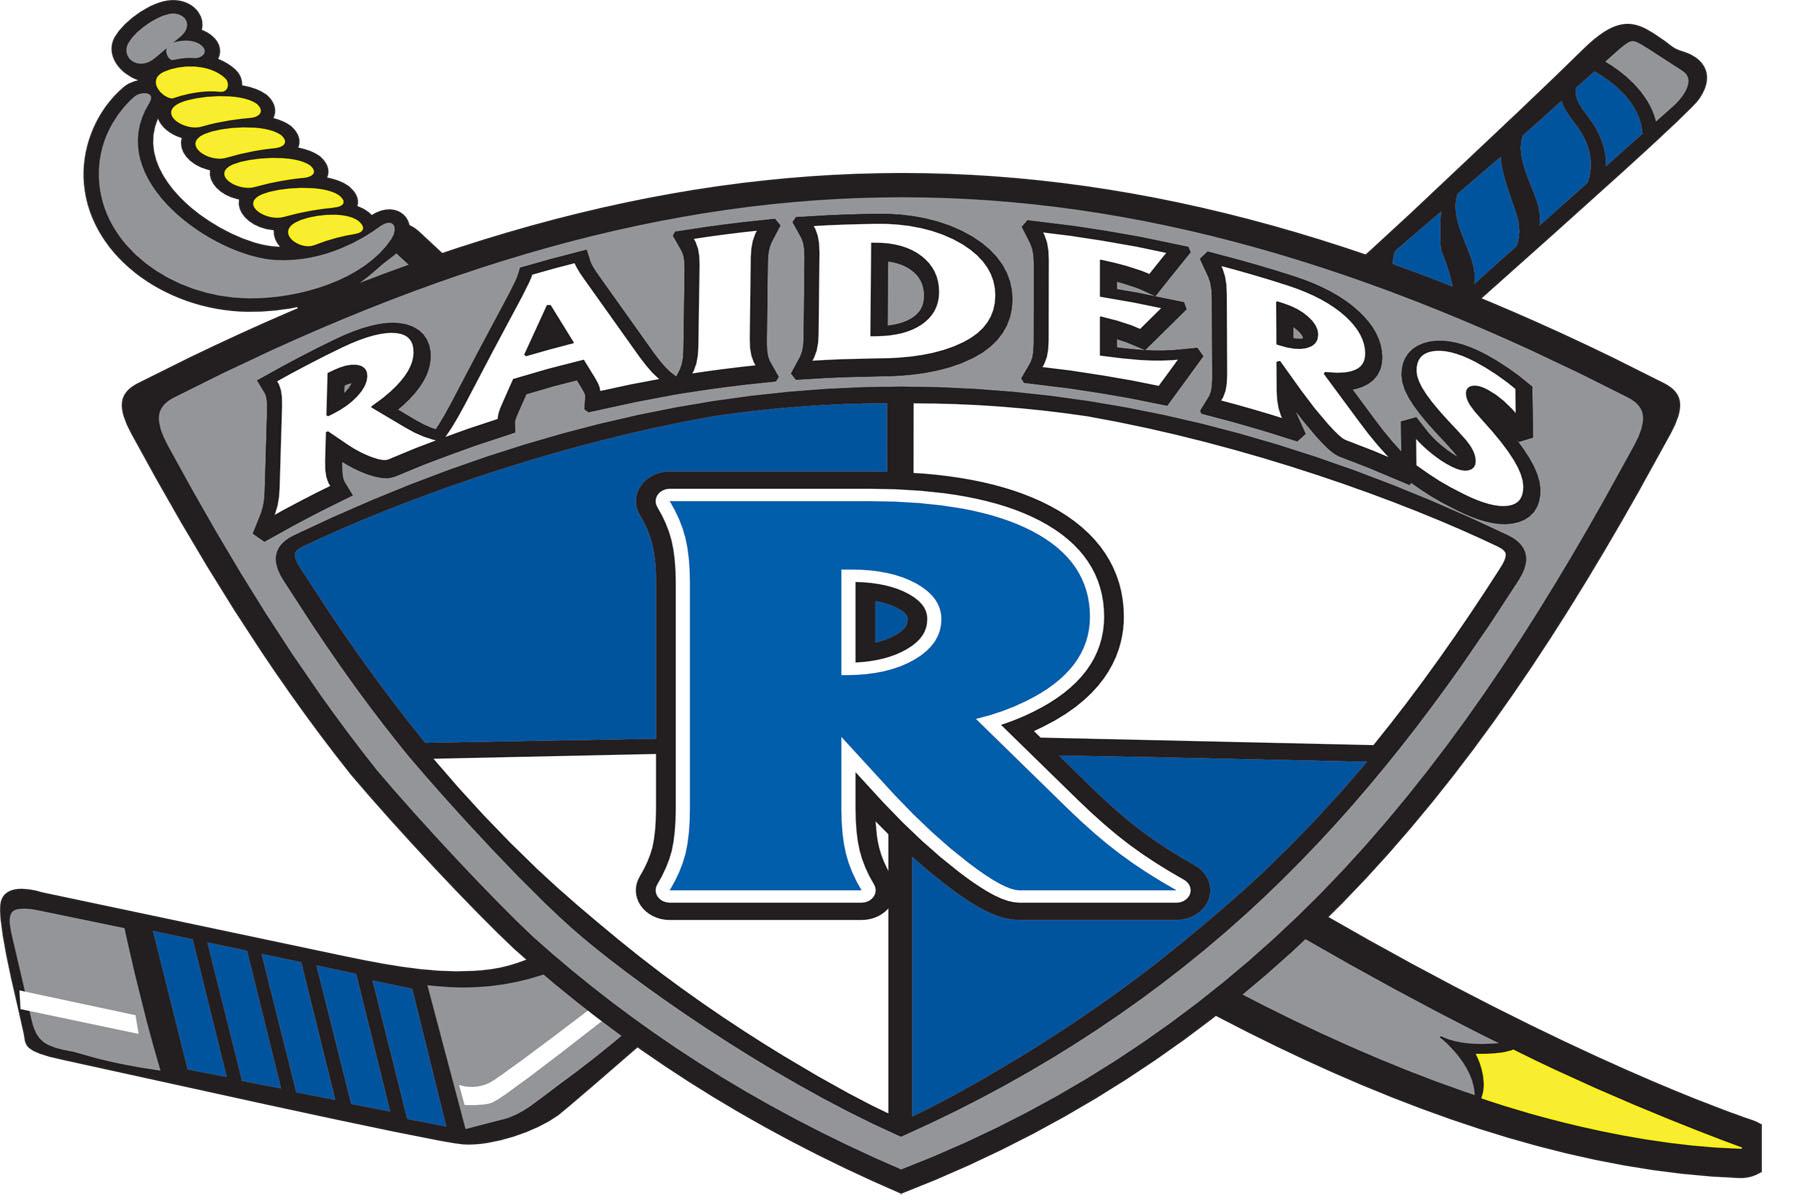 Reston_Raiders_New_Logo_FINAL-.jpg